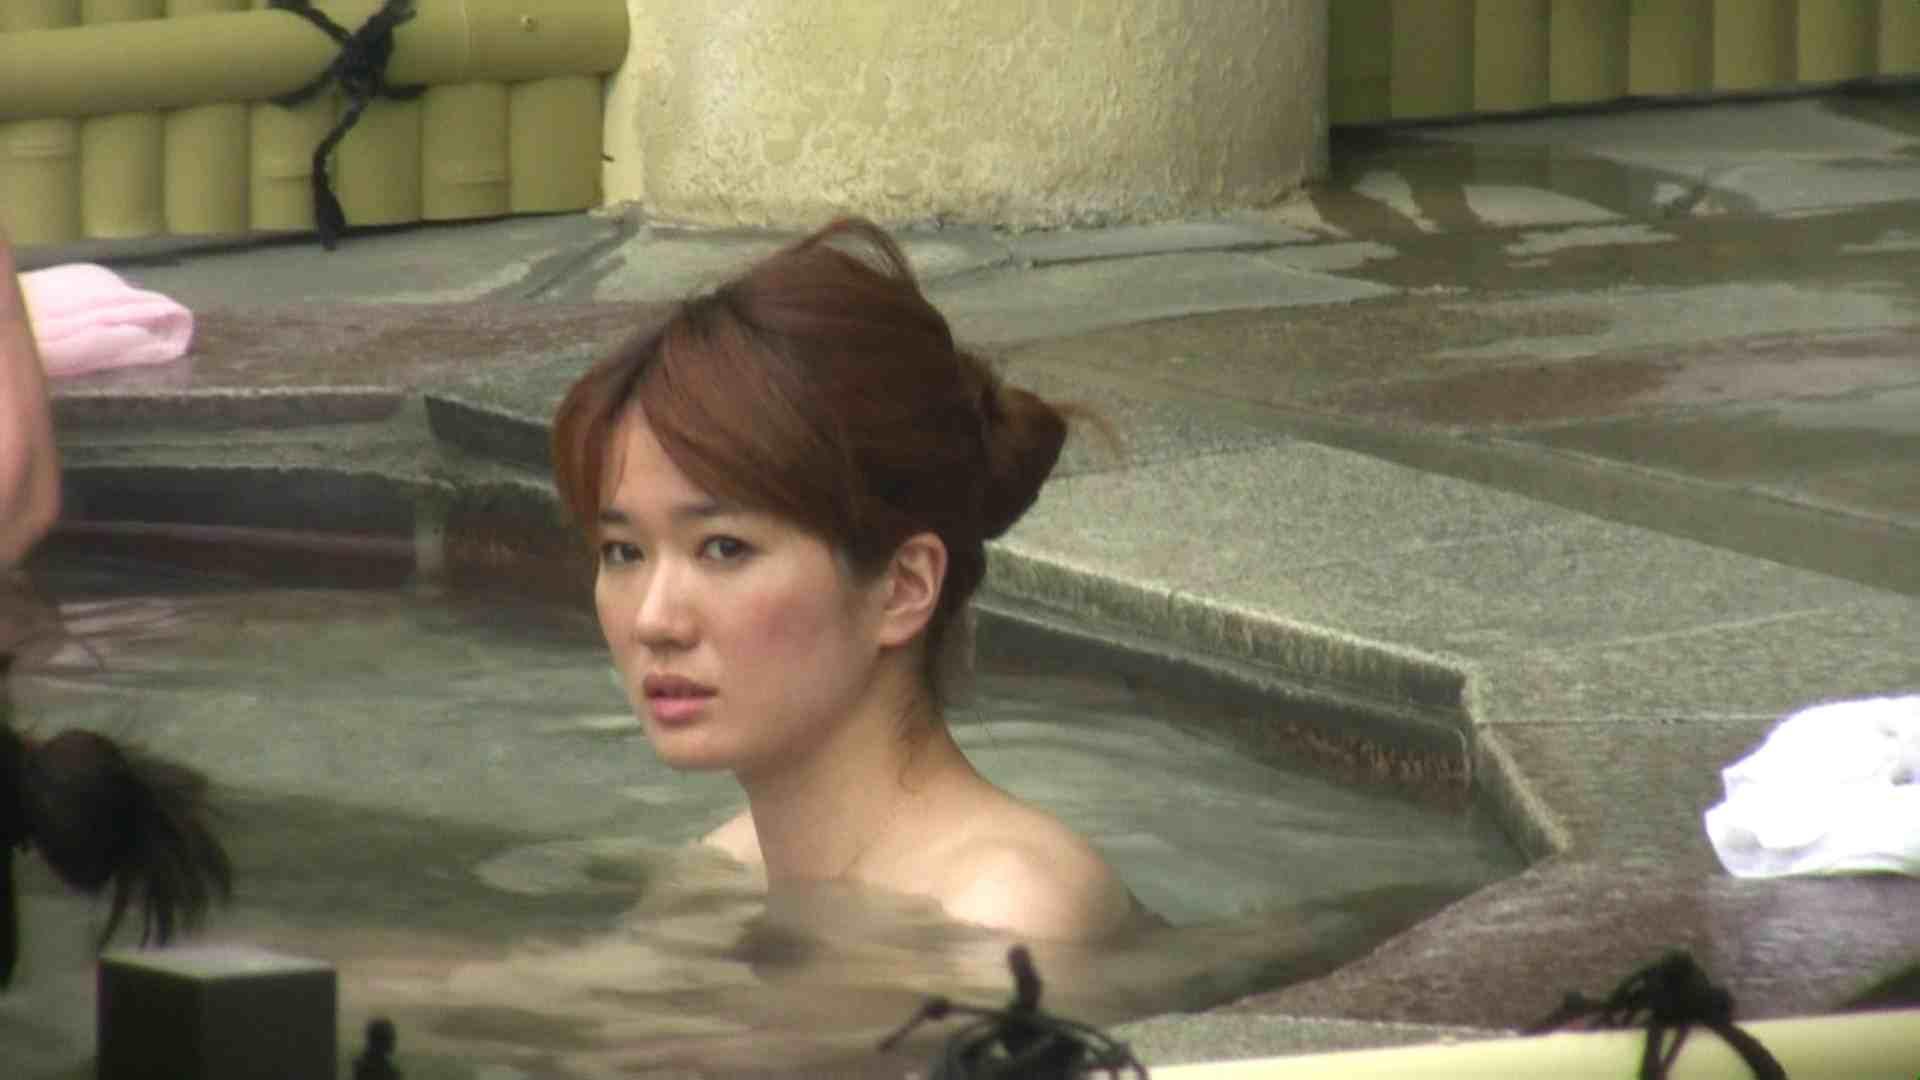 Aquaな露天風呂Vol.110 HなOL | 盗撮  71pic 4